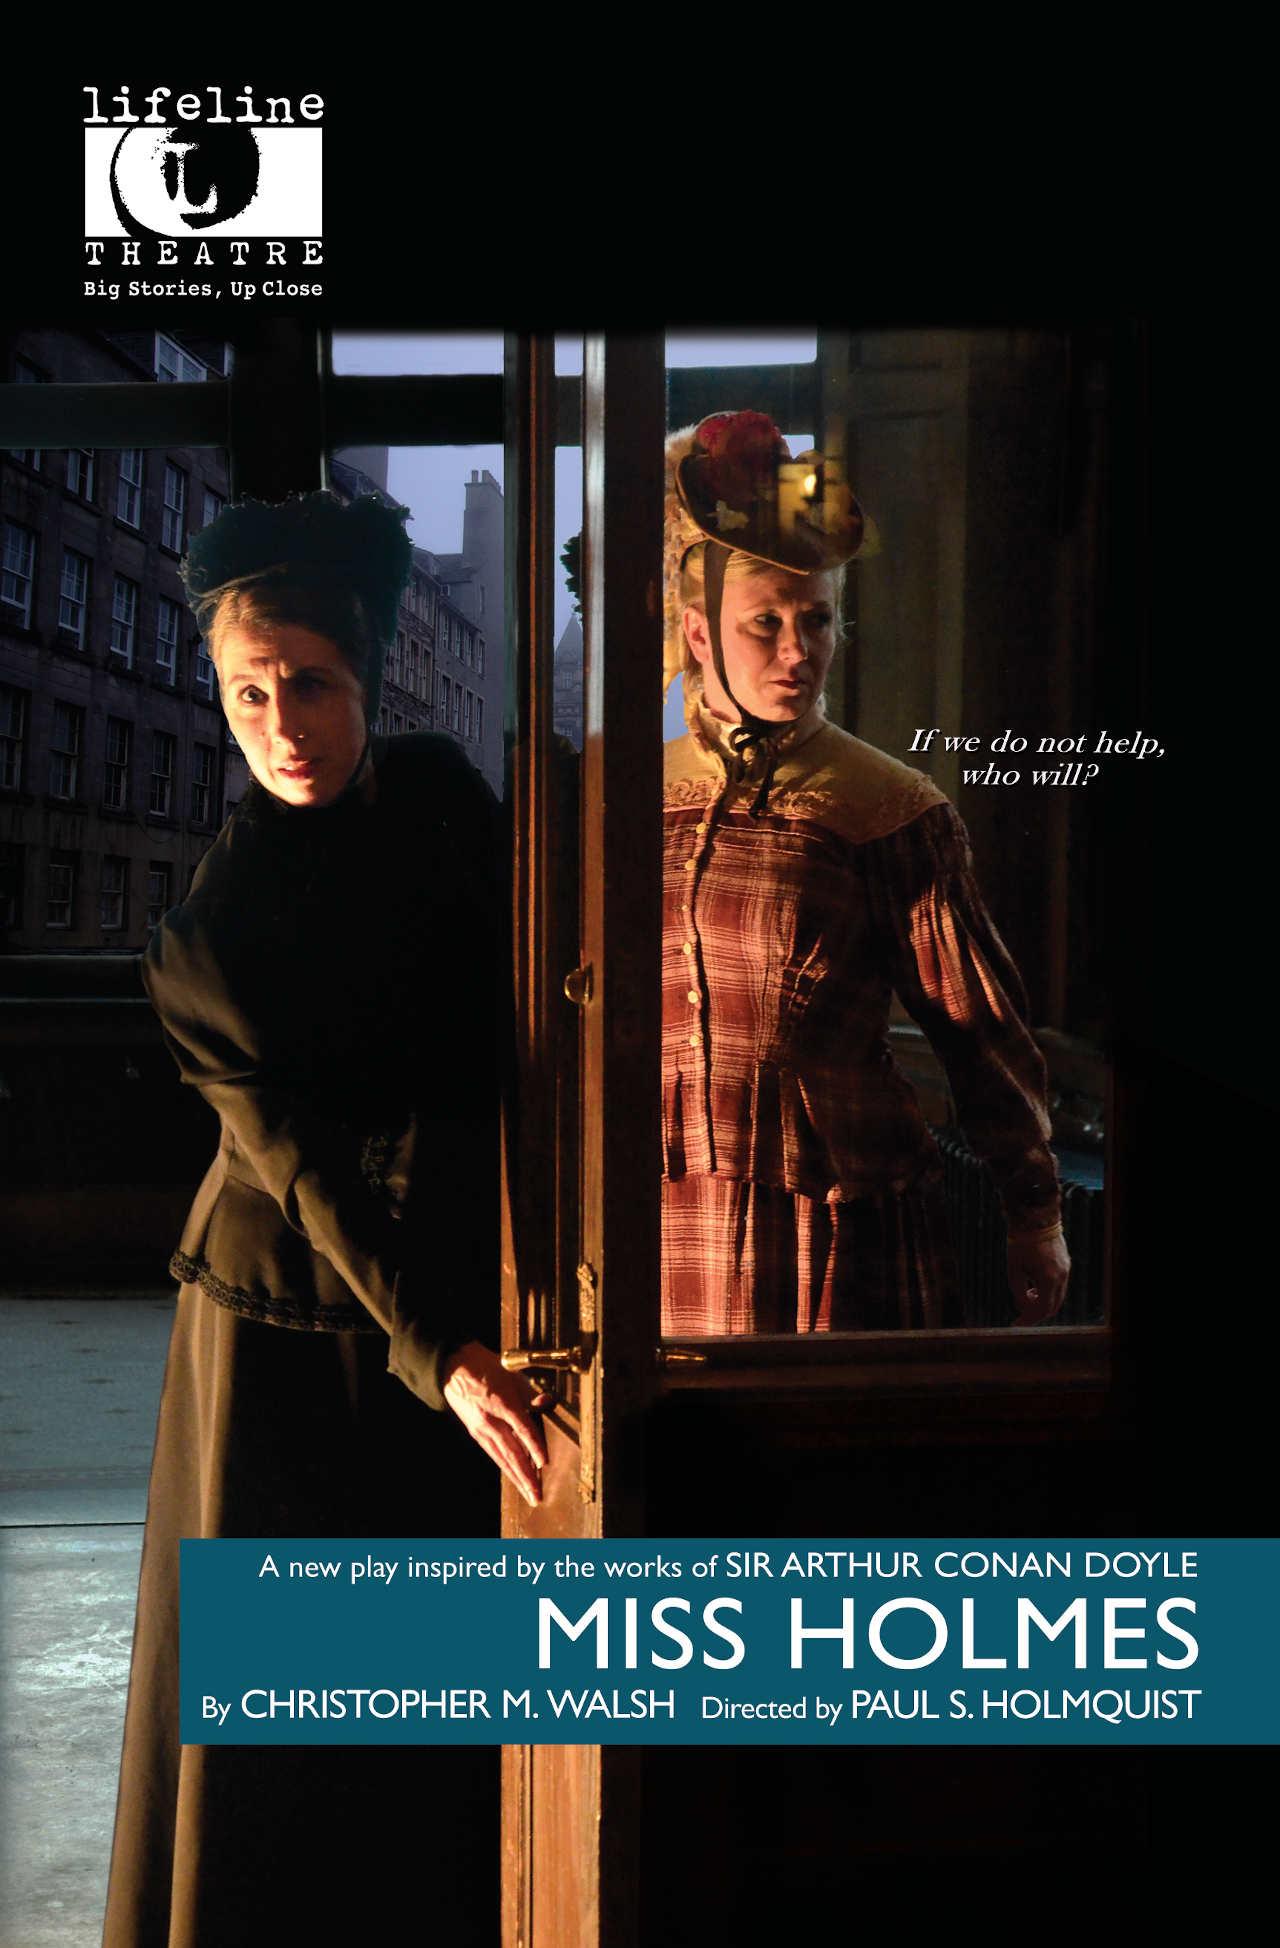 MISS HOLMES (Lifeline Theatre, 2016)